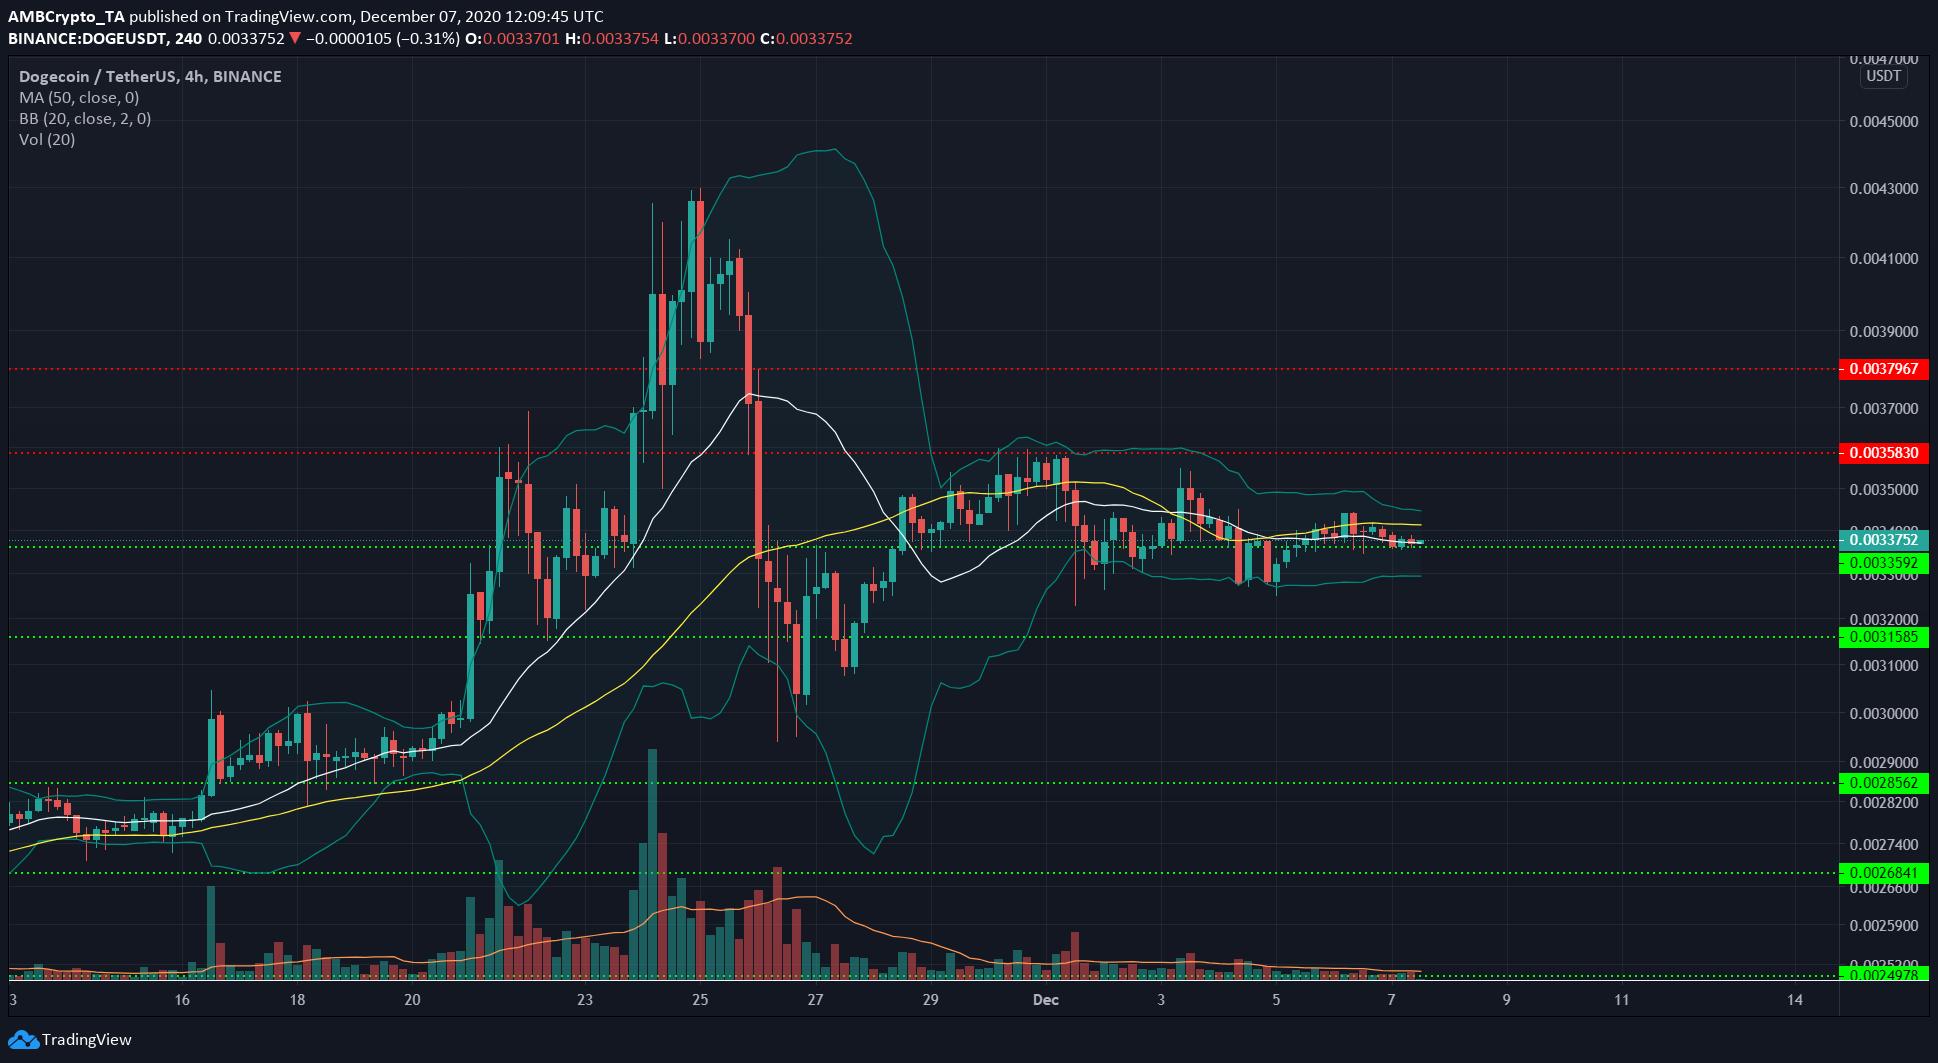 Bitcoin SV, Waves, Dogecoin Price Analysis: 07 December